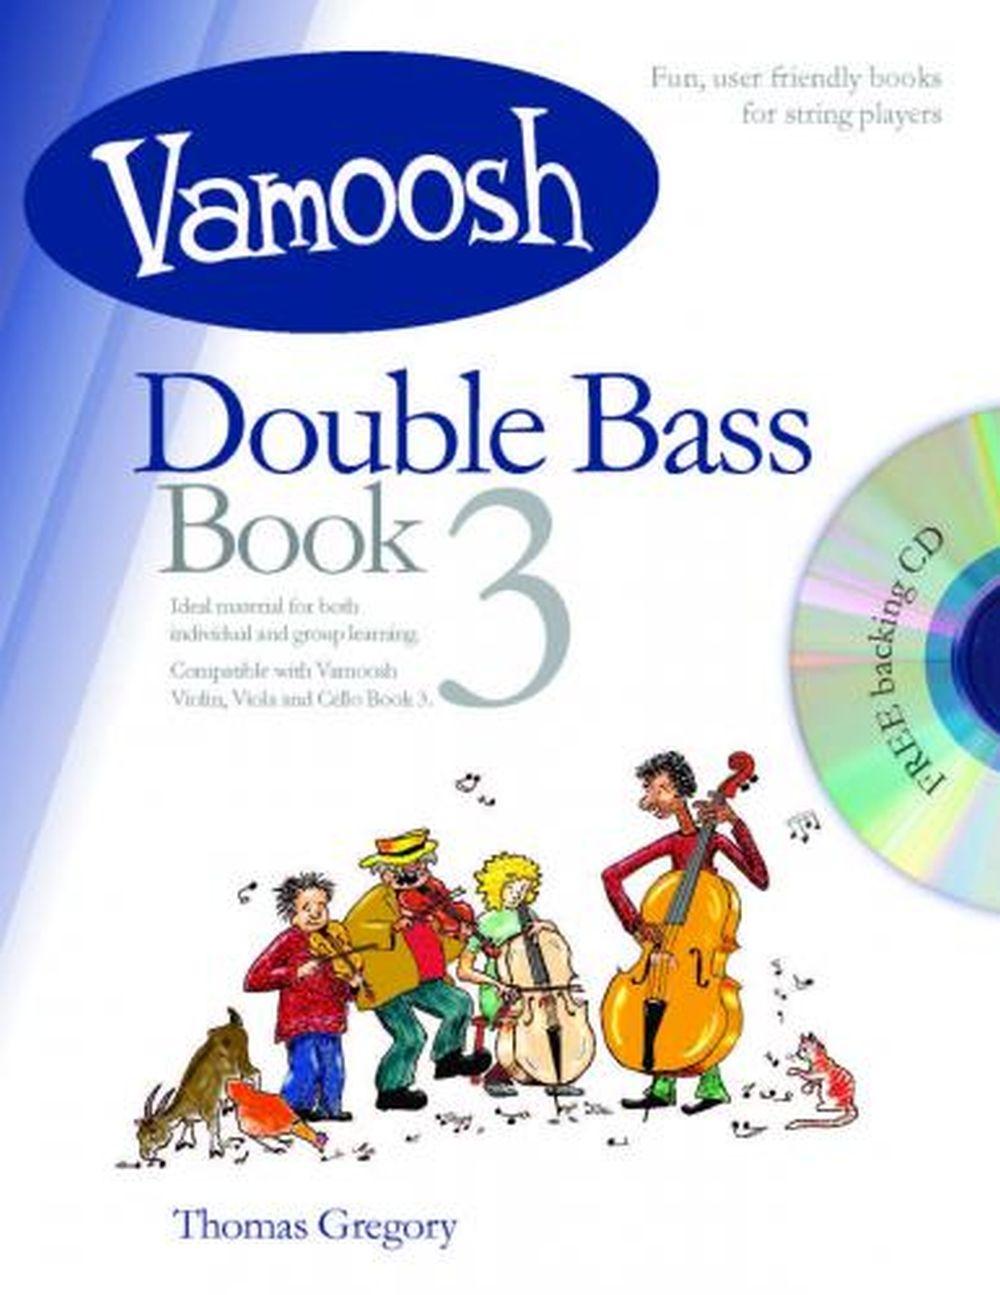 Thomas Gregory: Vamoosh Double Bass Book 3: Double Bass: Instrumental Tutor